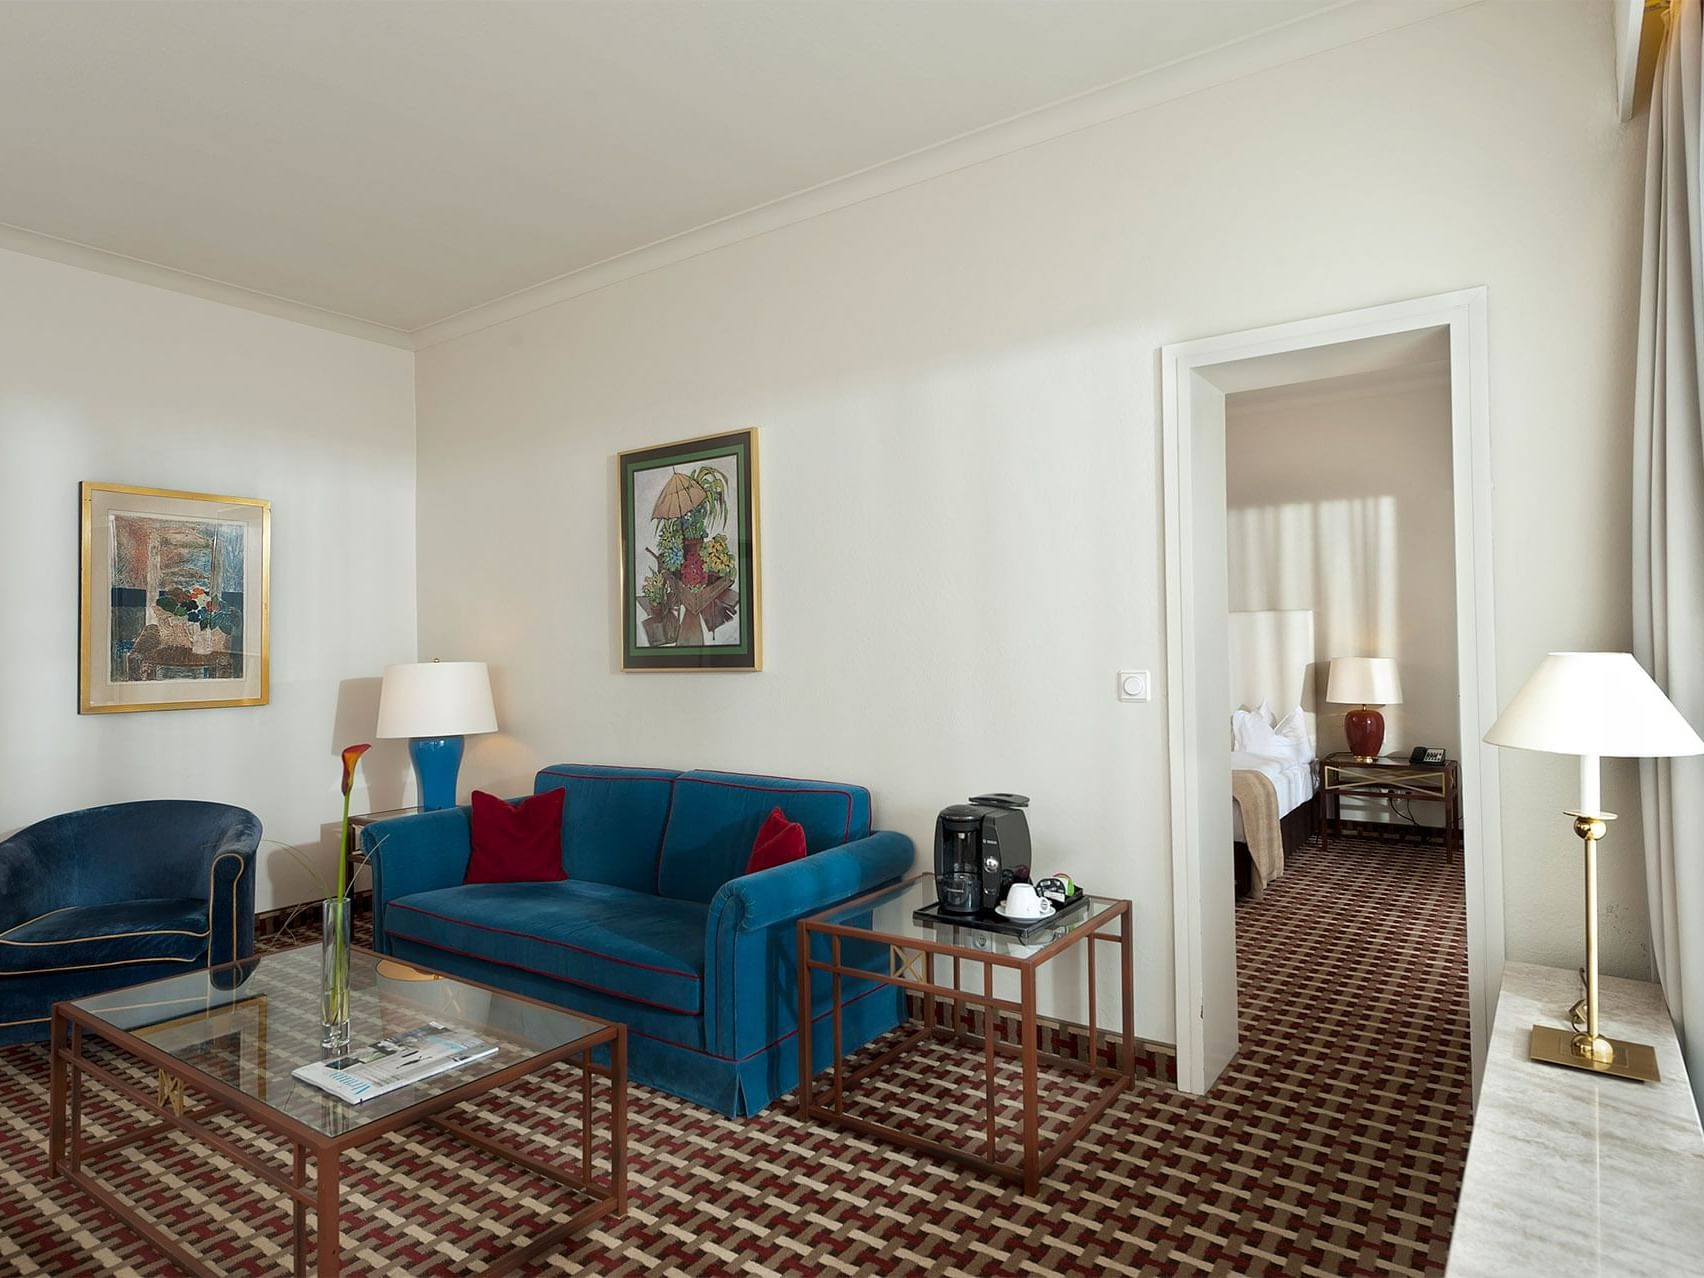 Lounge area in Superior Room at Precise Bad Reichenhall Bavaria